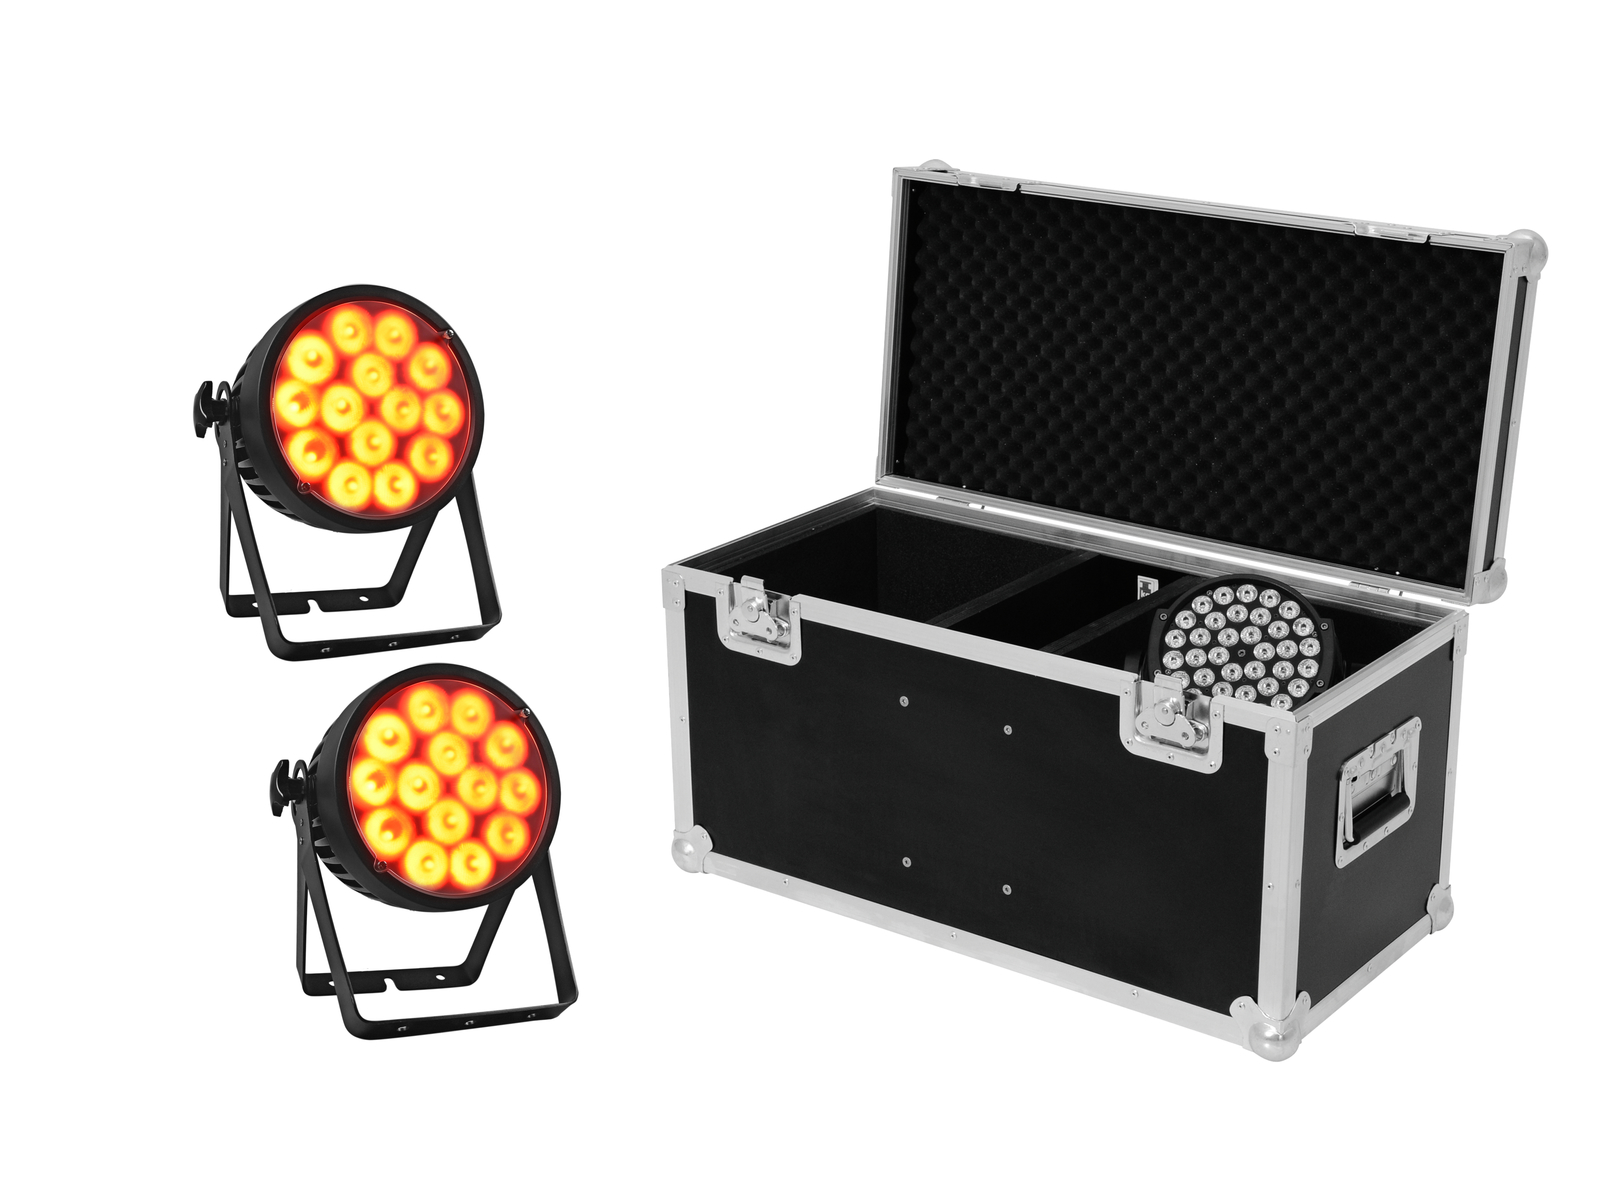 EUROLITE Set 2x LED IP PAR 14x10W HCL + Case